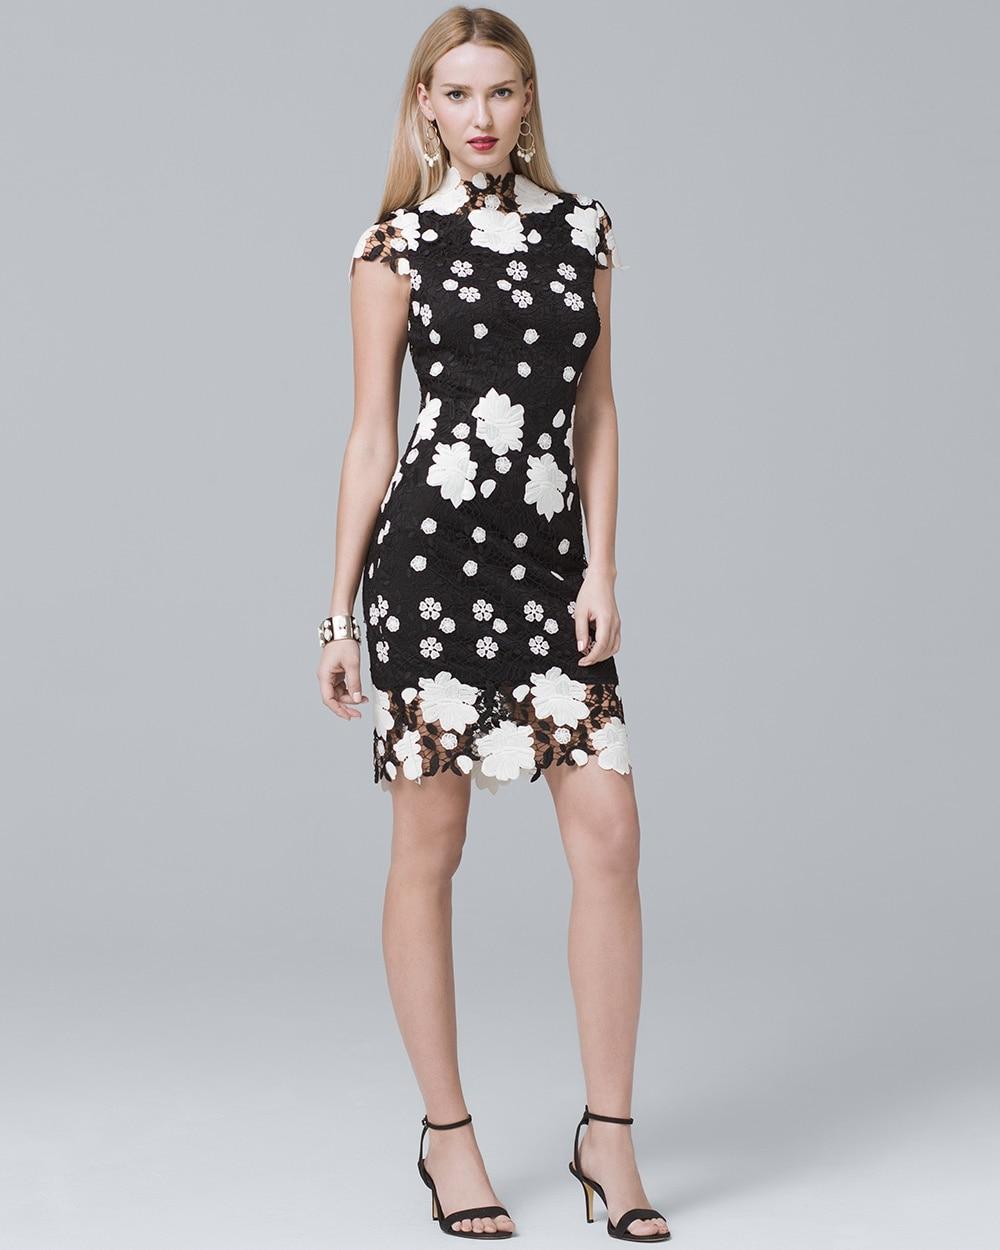 Cap Sleeve Floral Lace Sheath Dress White House Black Market